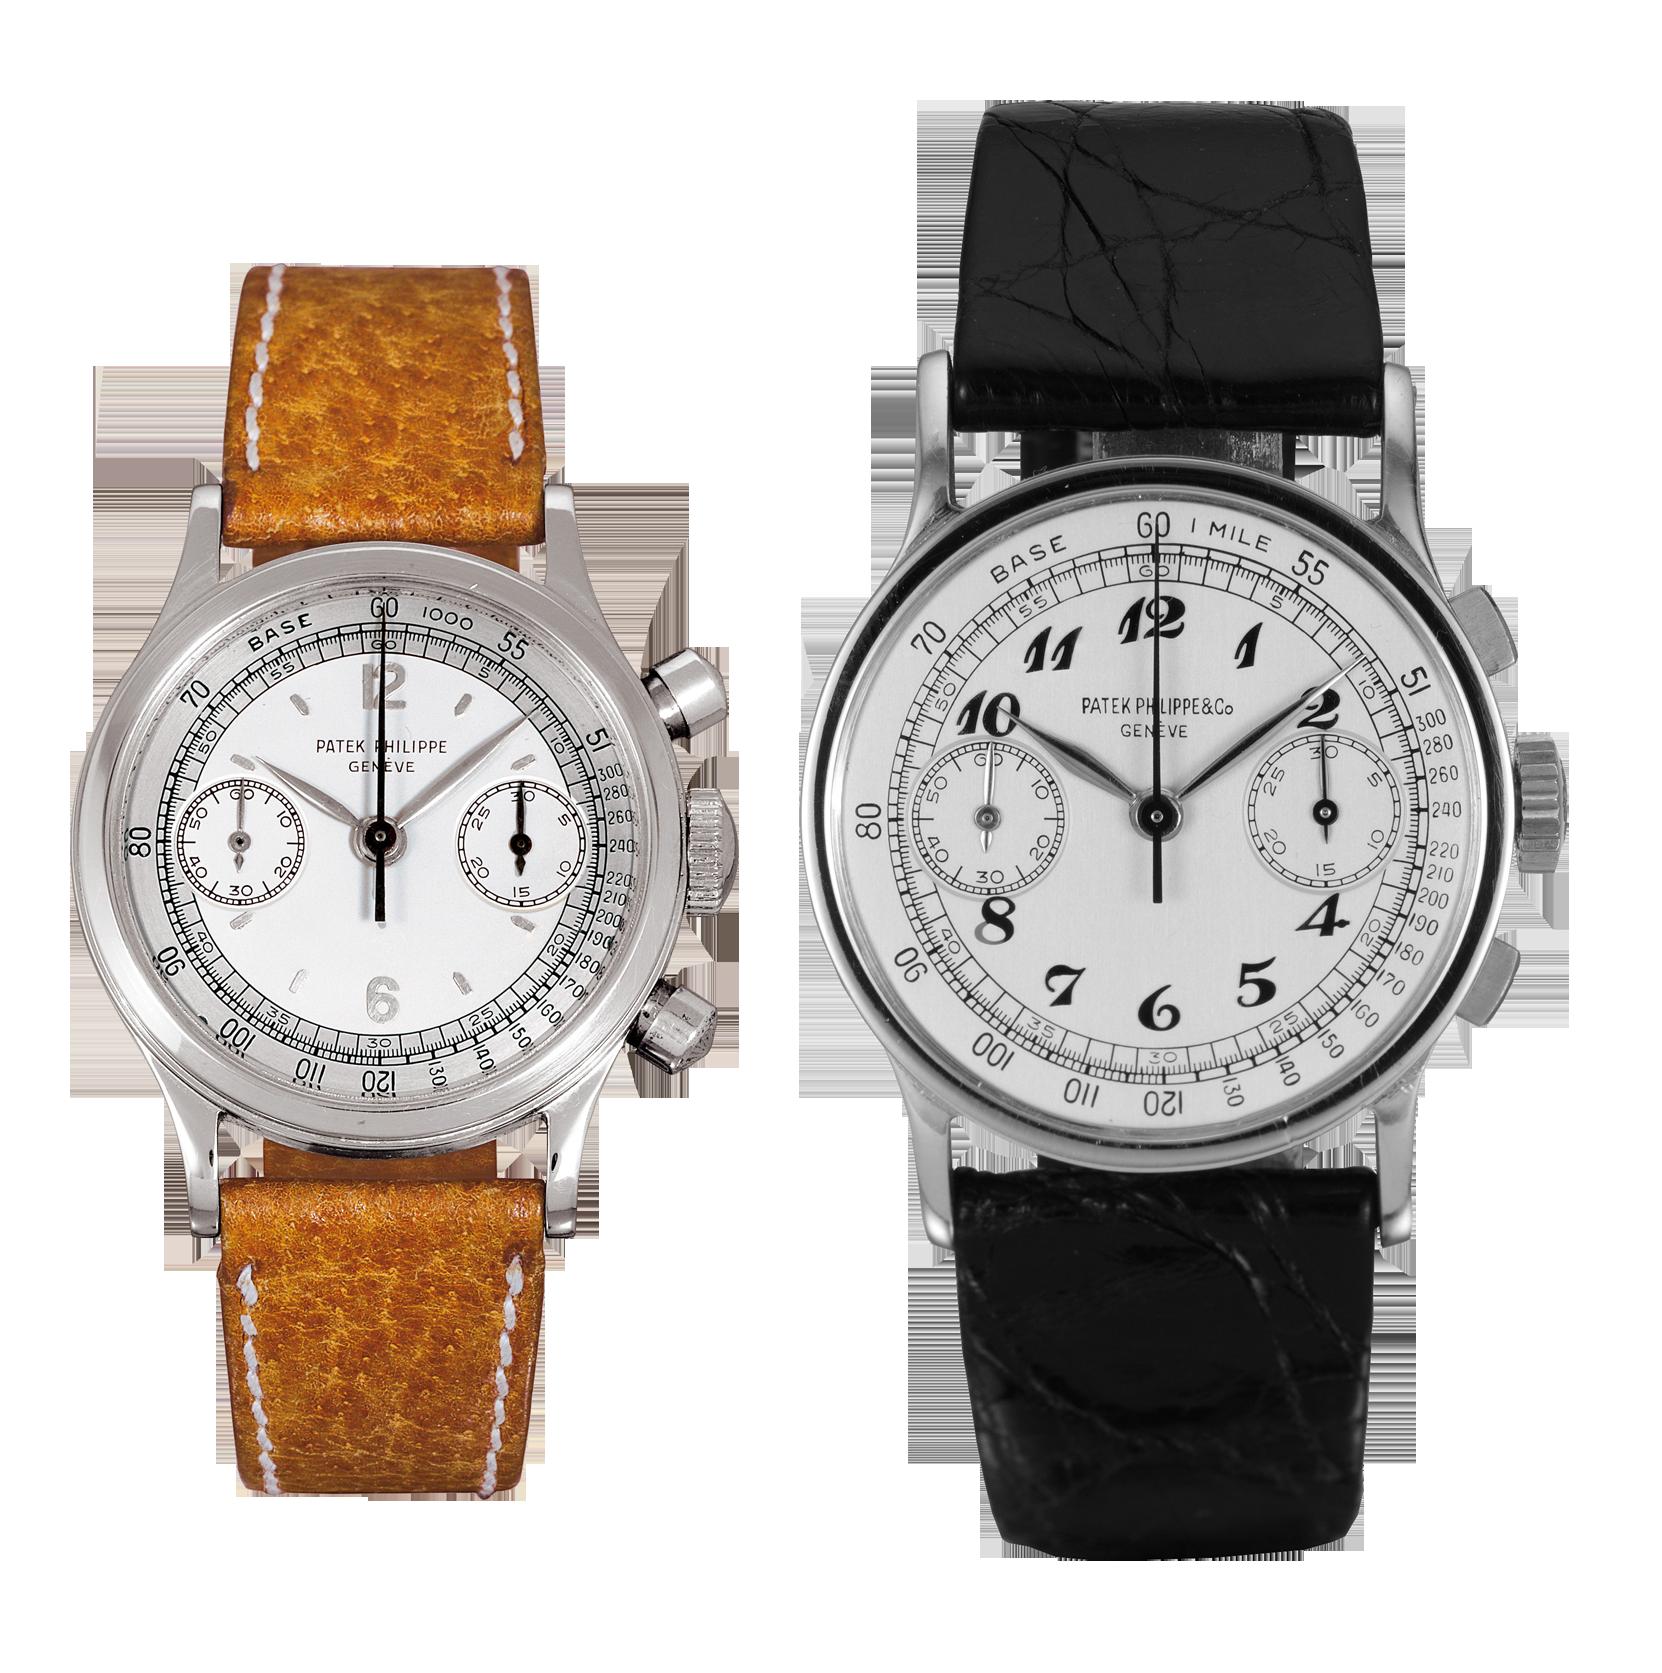 Wrist Band Watch PNG Image Green wall clocks, Clock